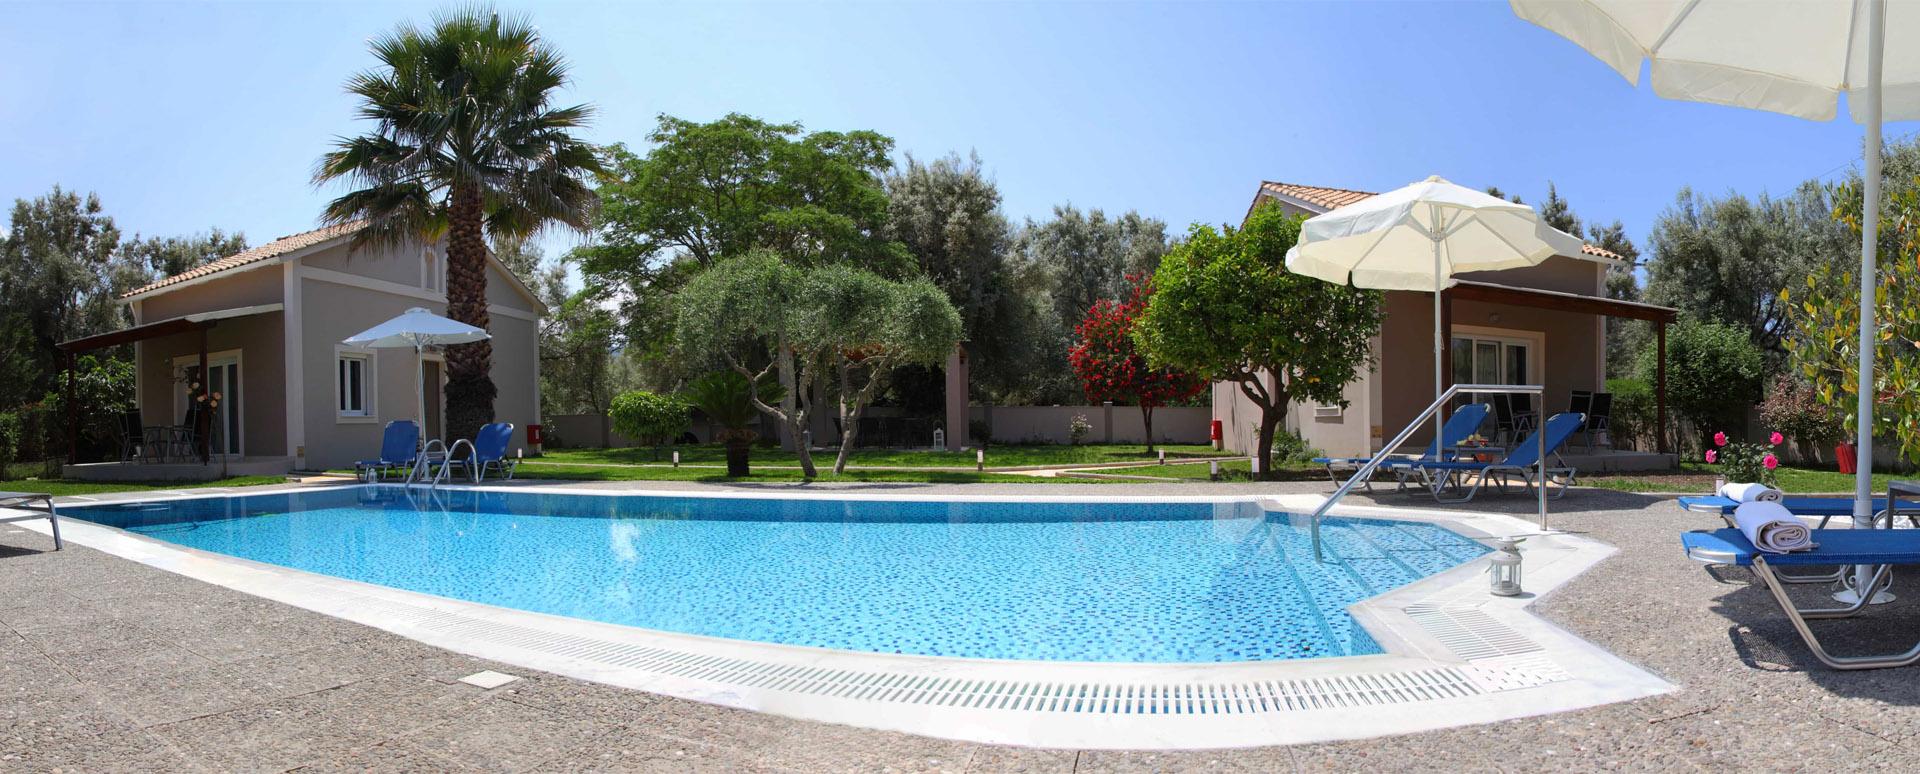 VoltaVillas-luxury-villa-studio-lefkada-photo-gallery